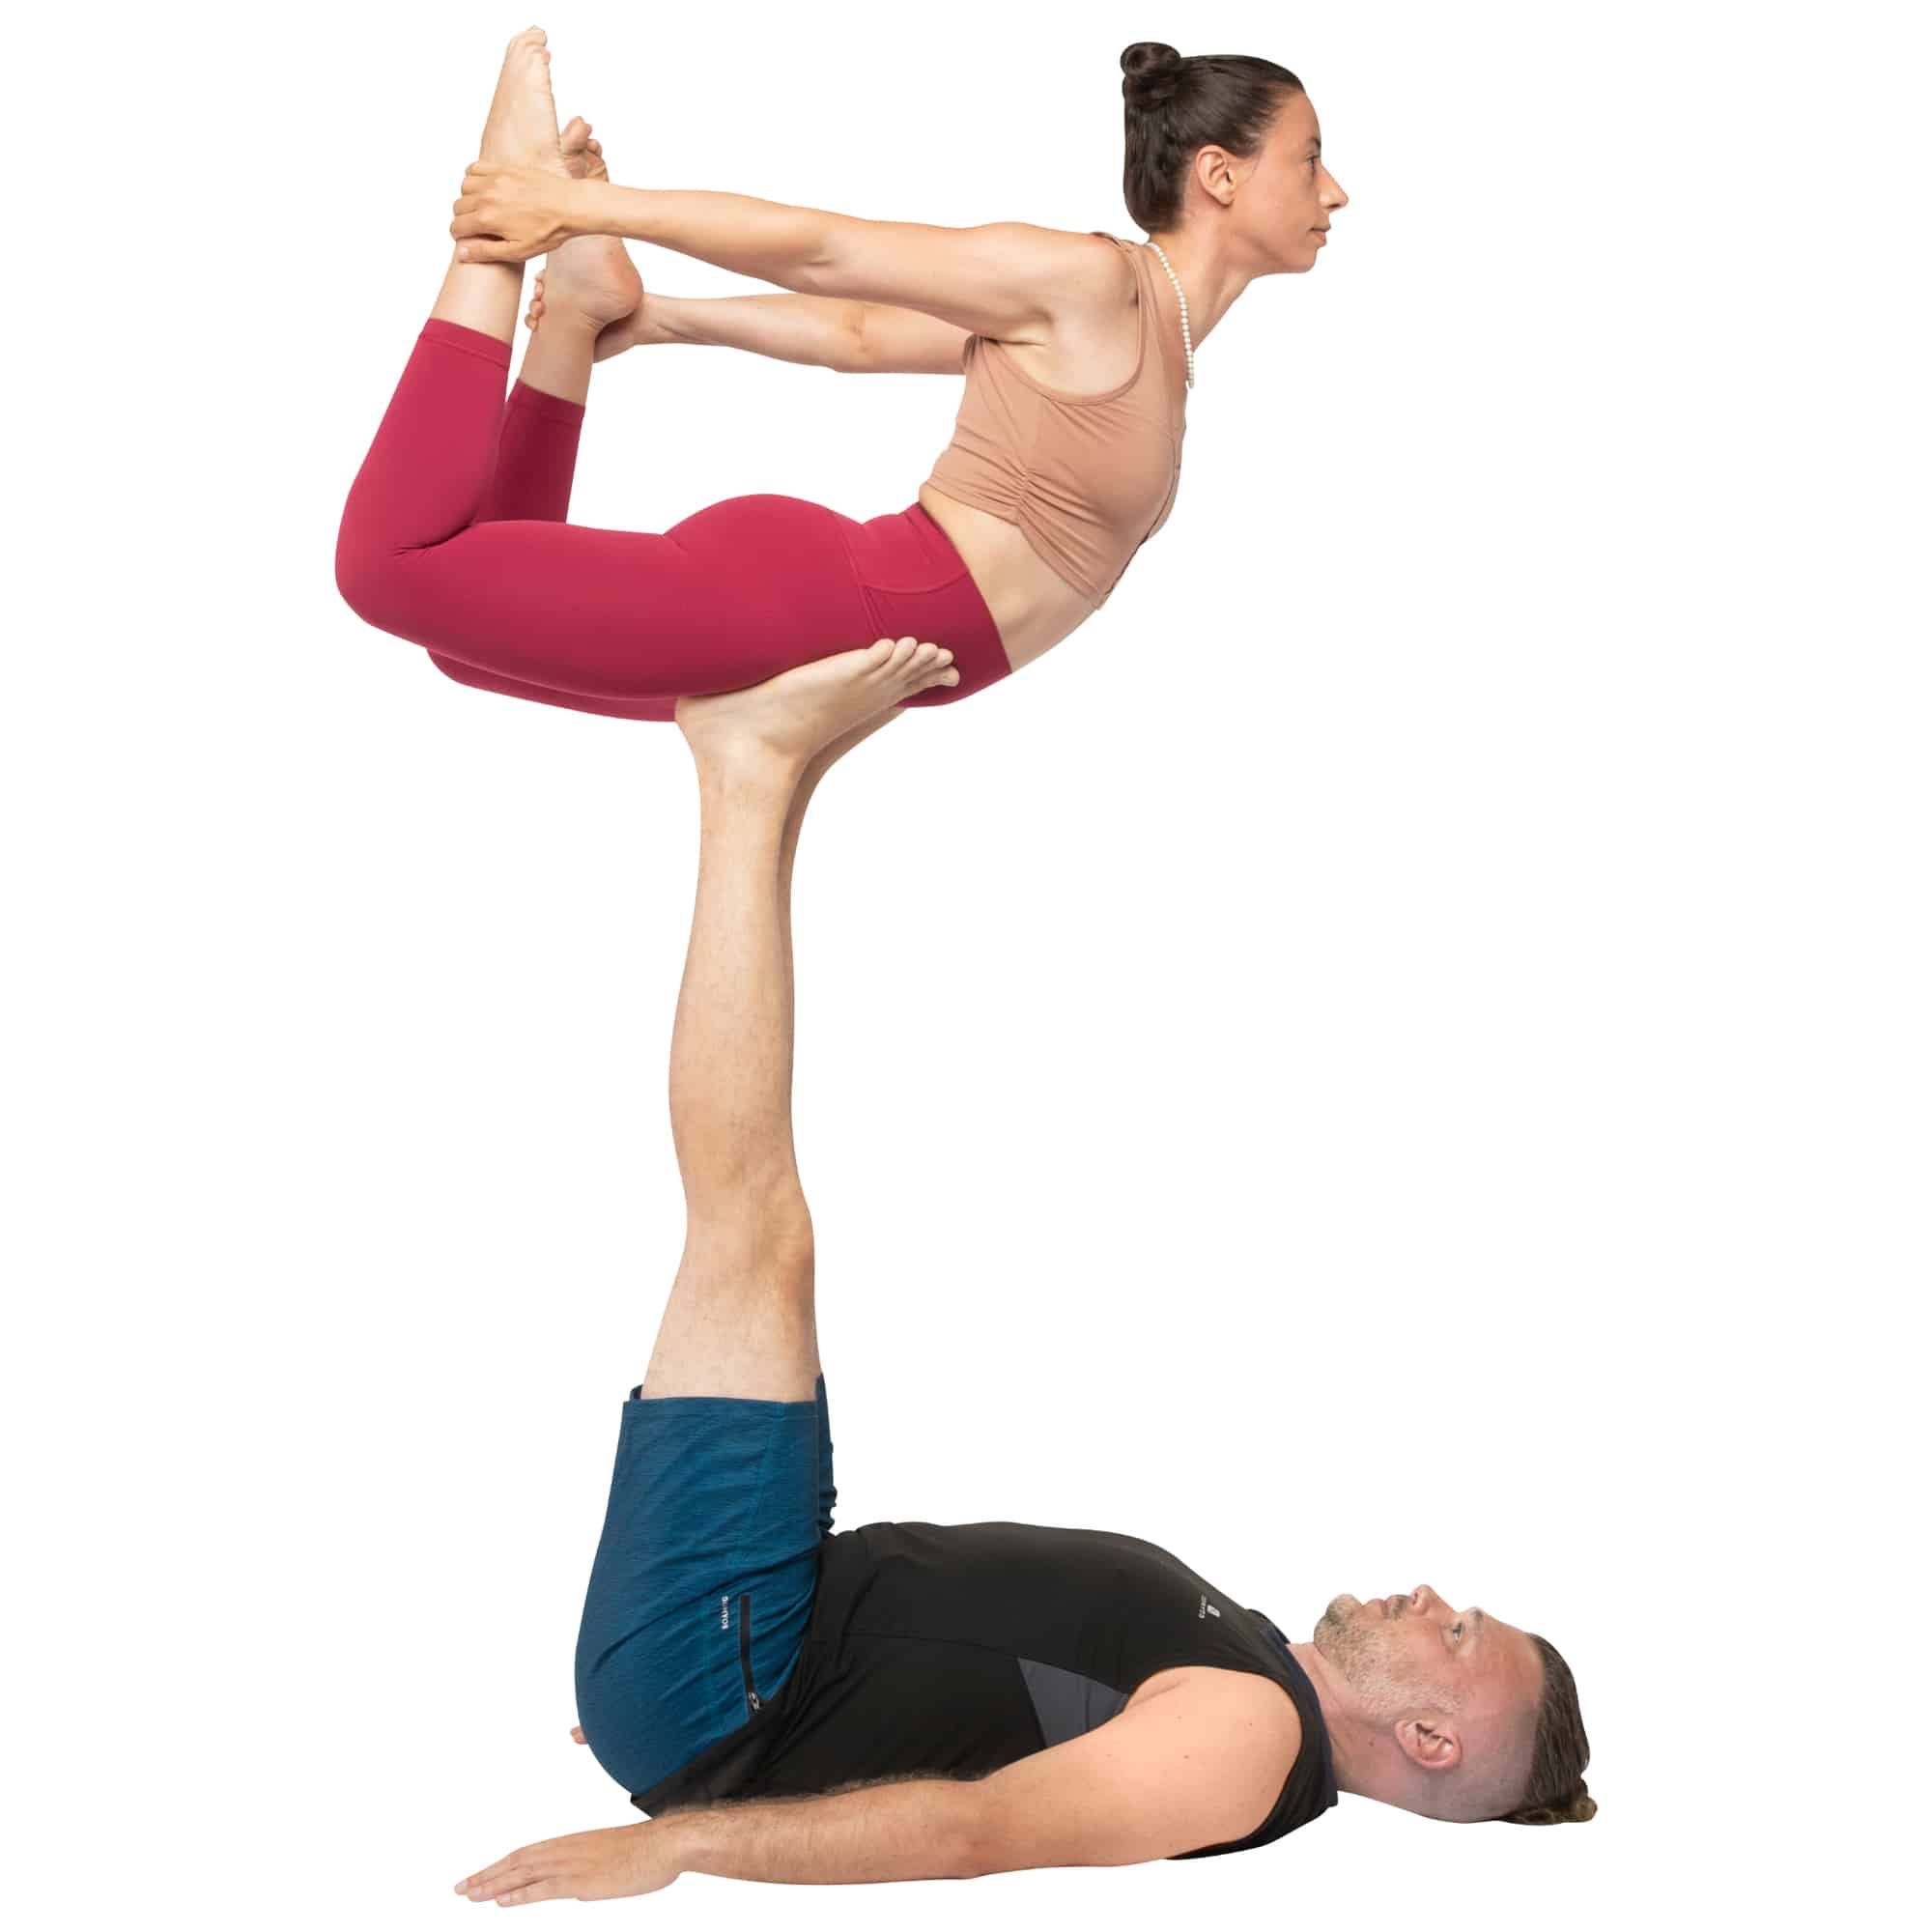 acroyoga haltung pose Bow